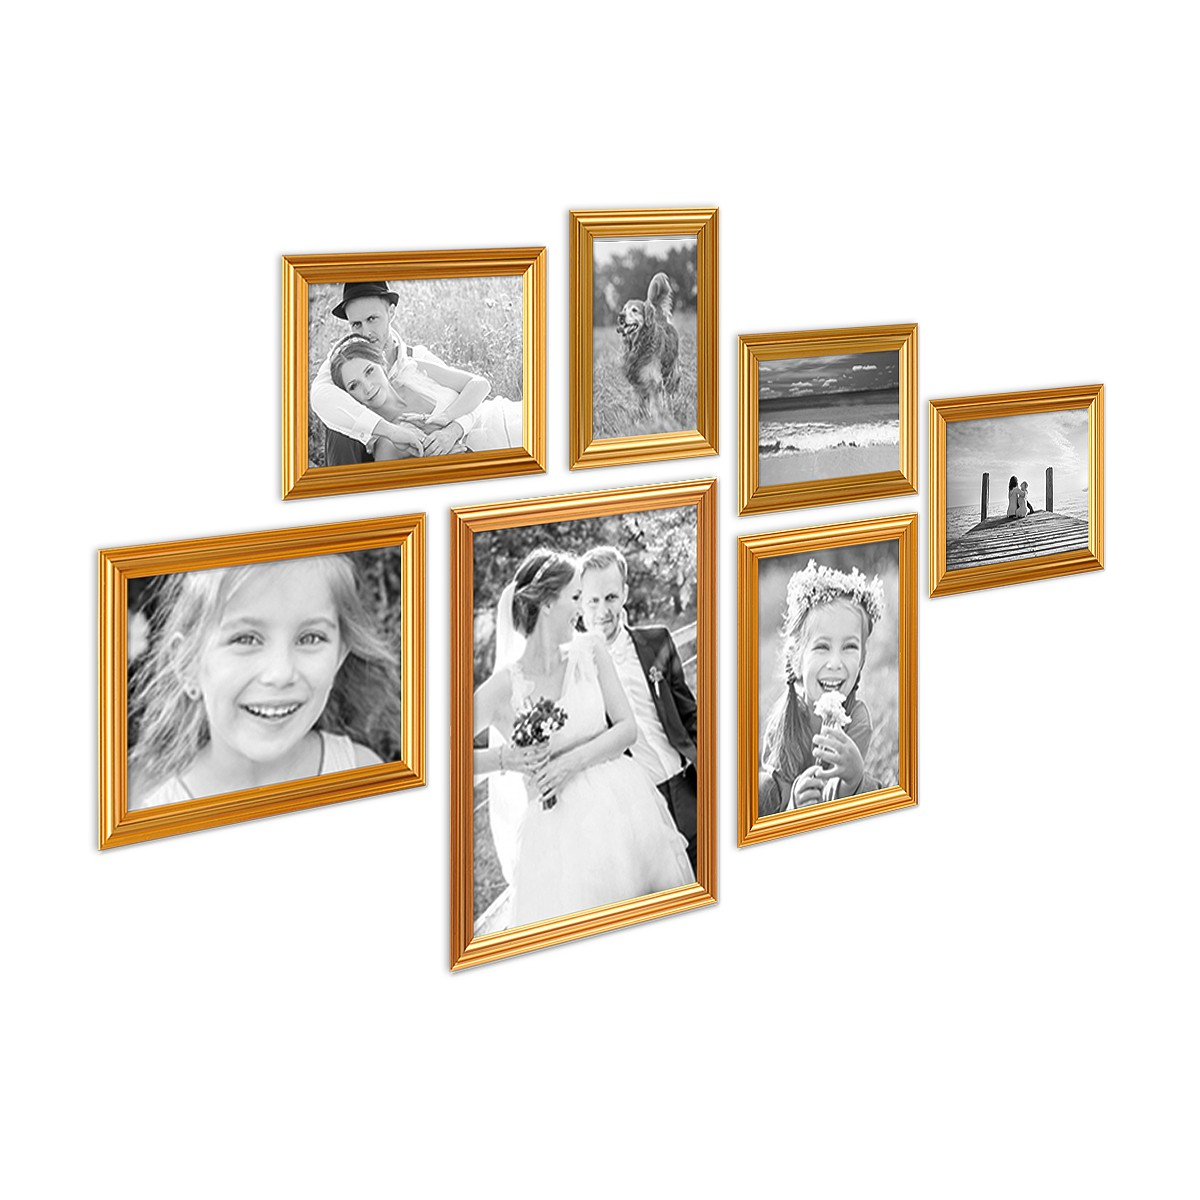 7er Bilderrahmen-Set Gold Barock Antik aus Kunststoff inklusive ...